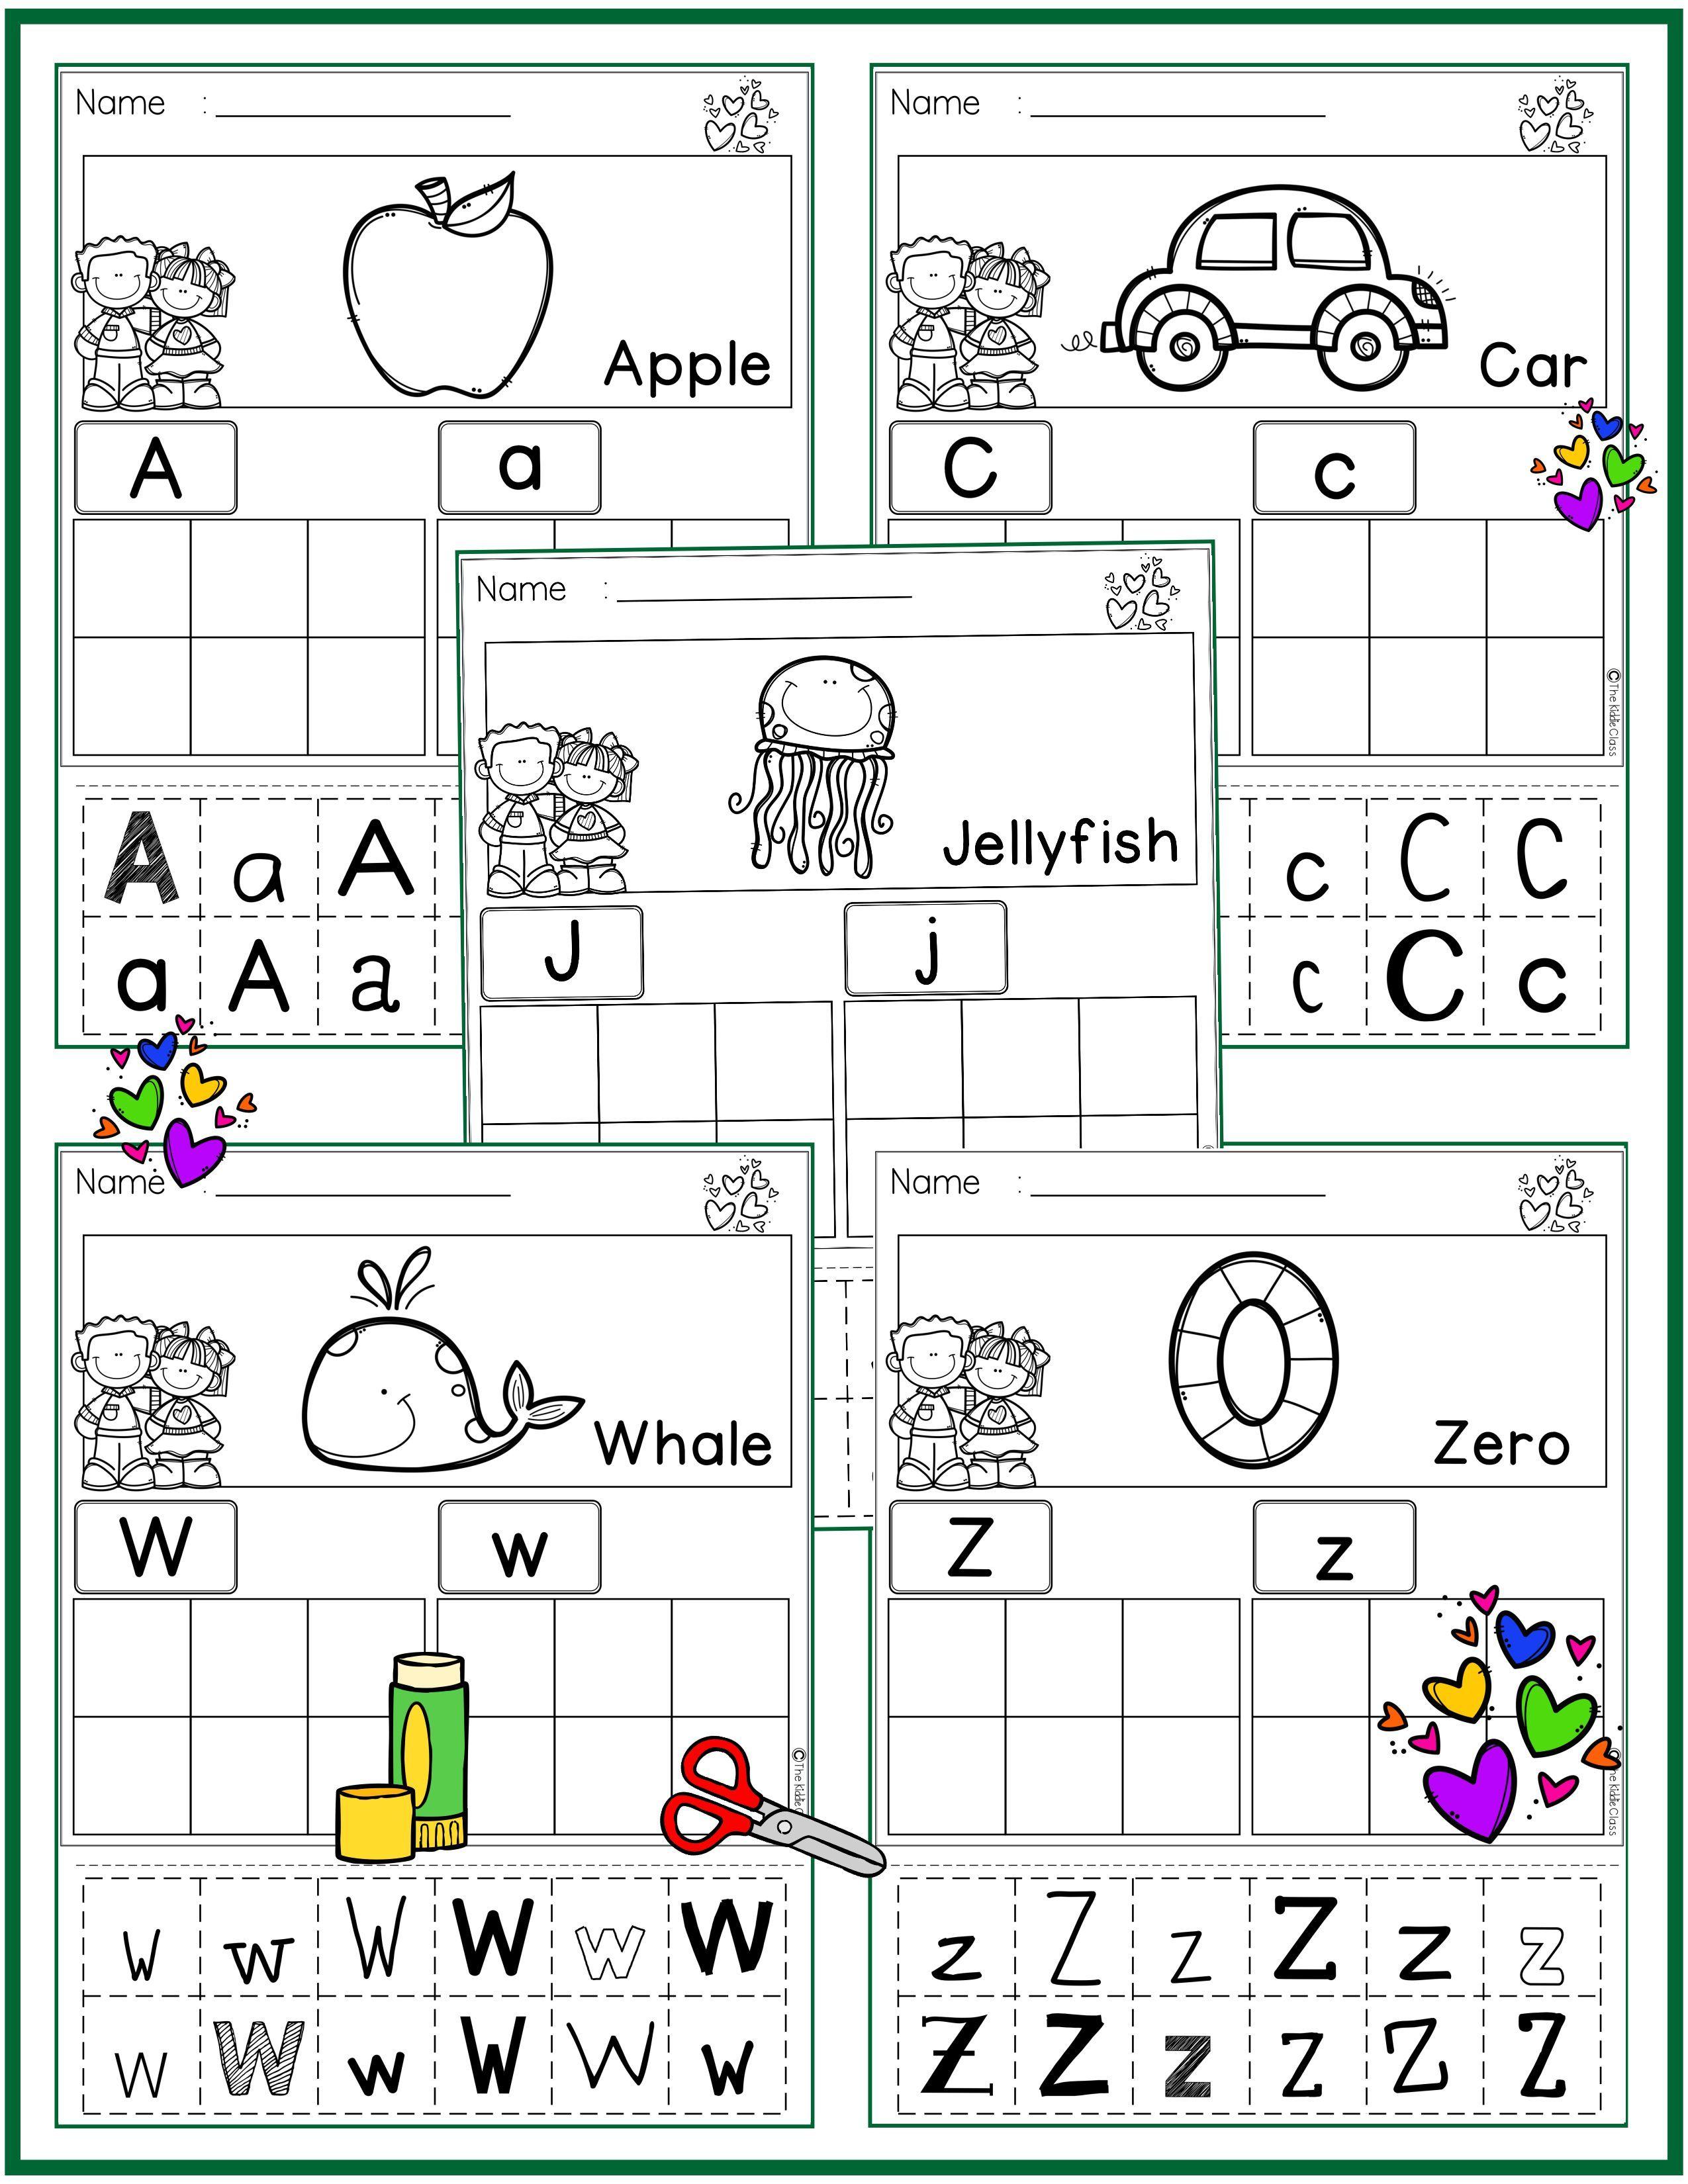 What is the cutoff date for kindergarten in Brisbane